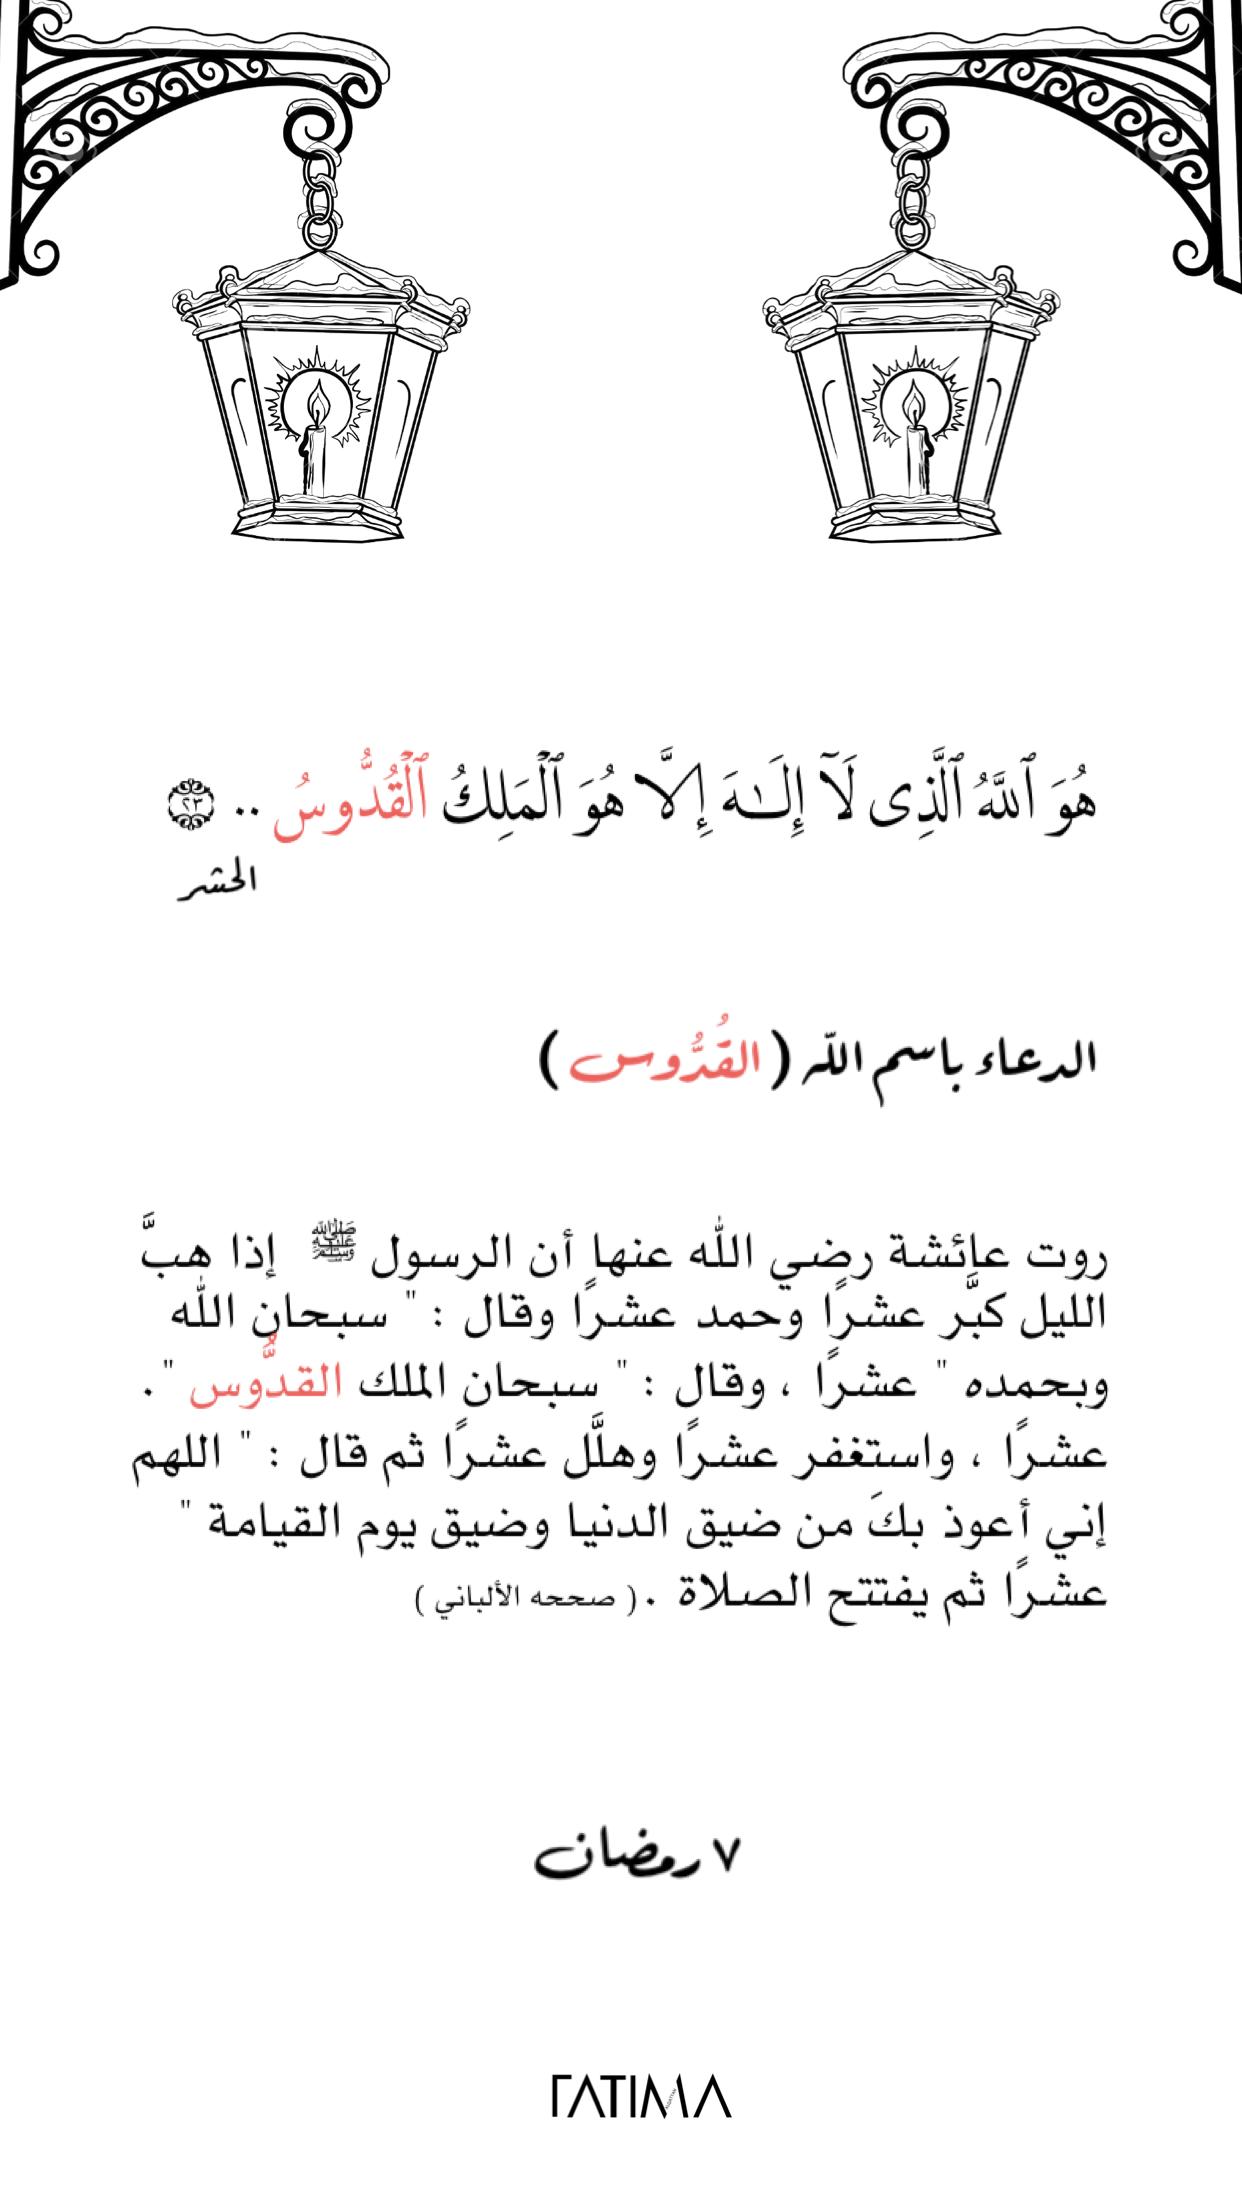 Ramadan Kareem رمضان دعاء ذكر Ramadan Quotes Islamic Phrases Islamic Quotes